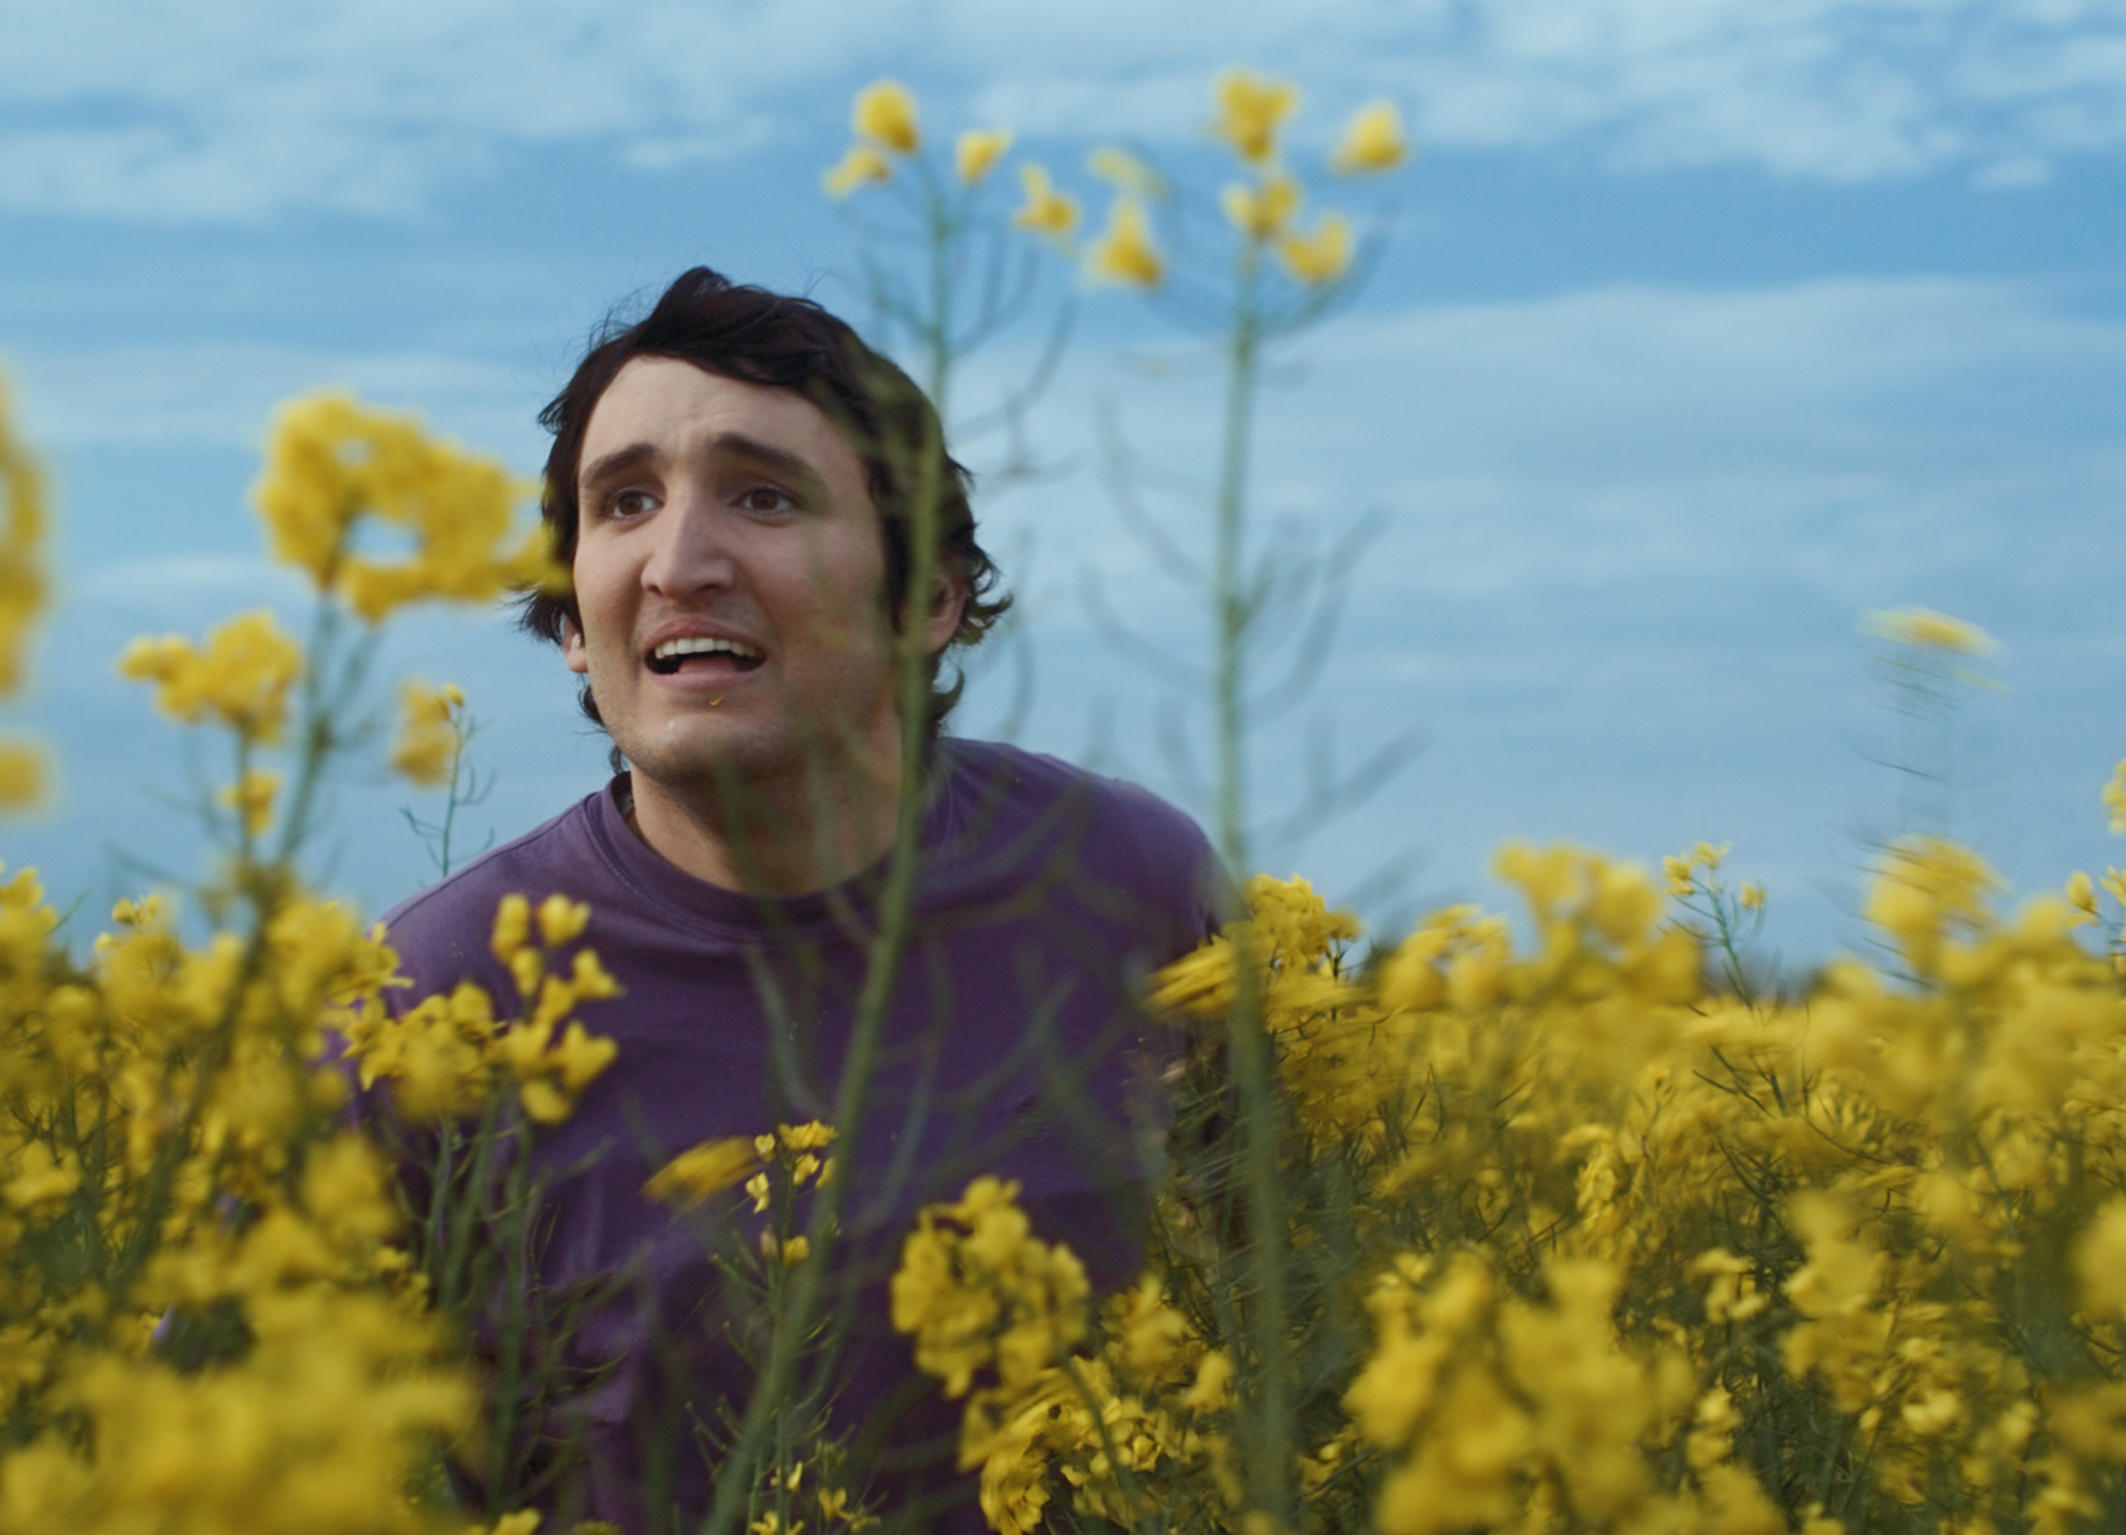 La felicit porta fortuna lo sguardo del cinema tedesco - La felicita porta fortuna ...